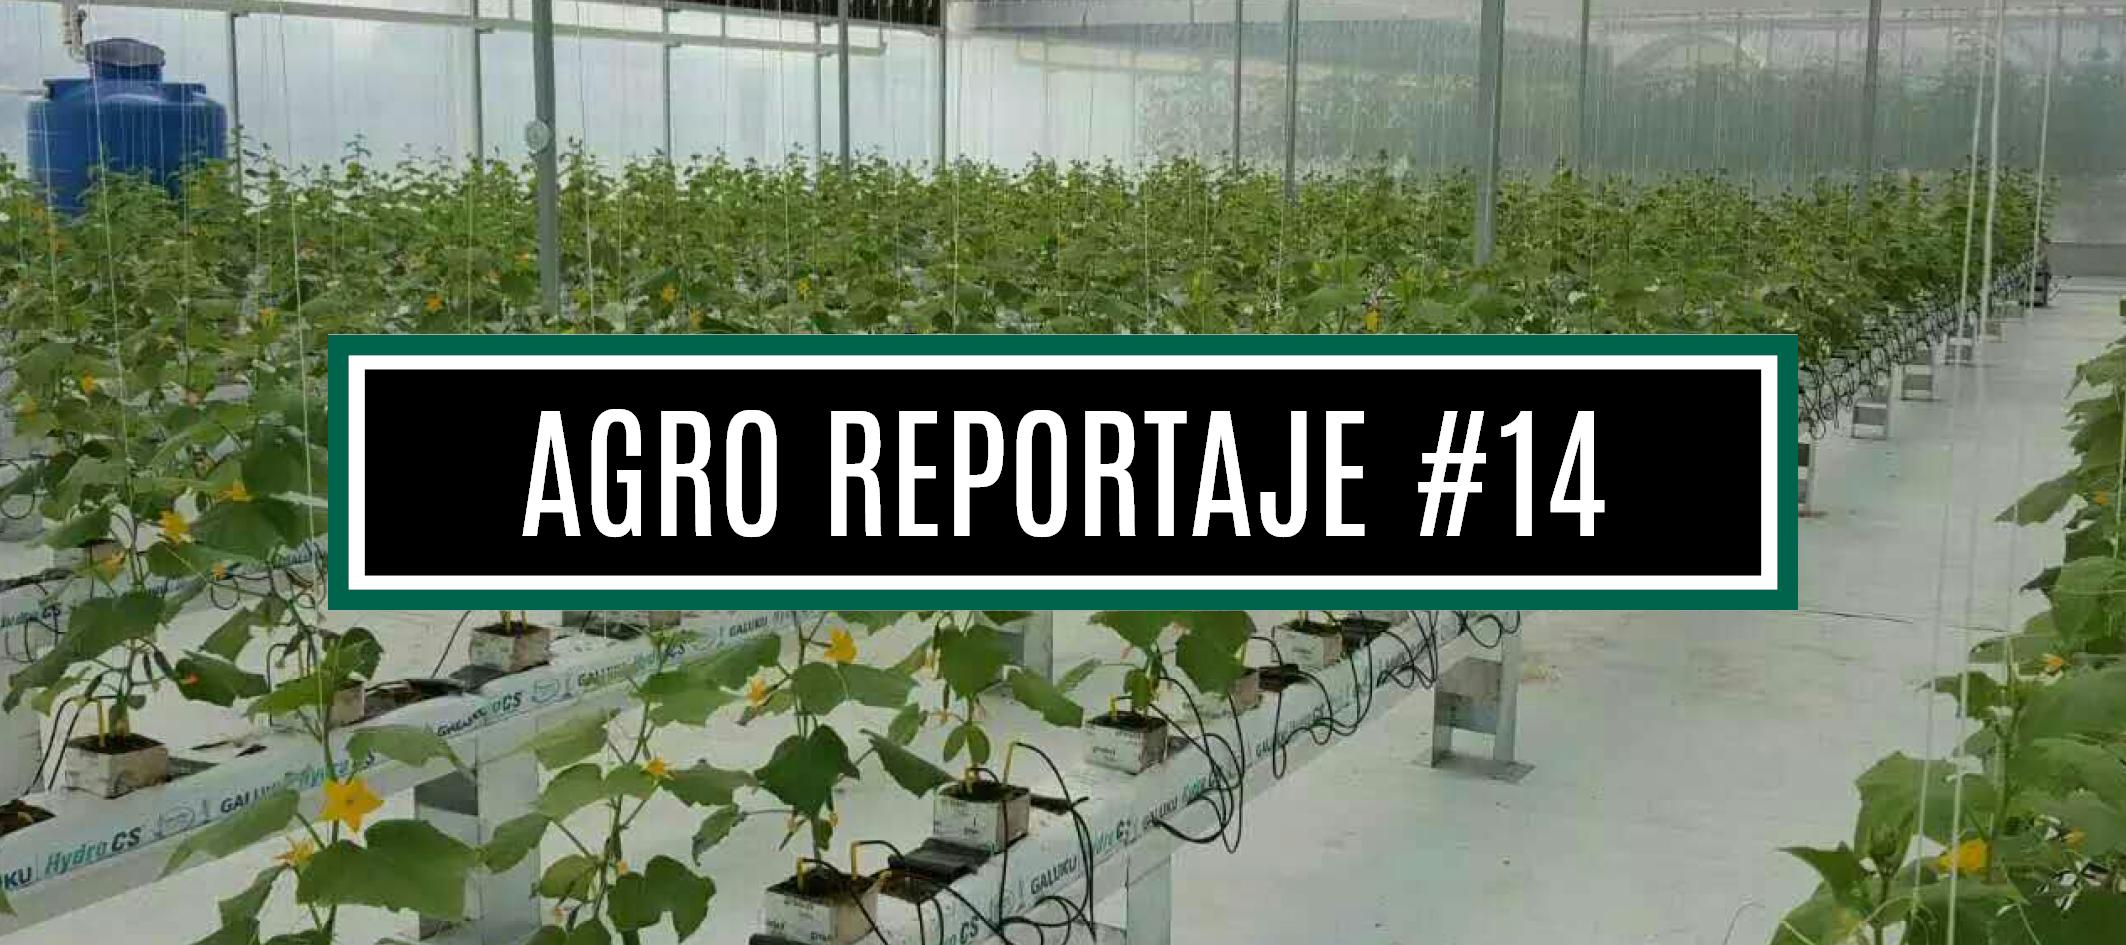 AGRO REPORTAJE #14 (WEB)